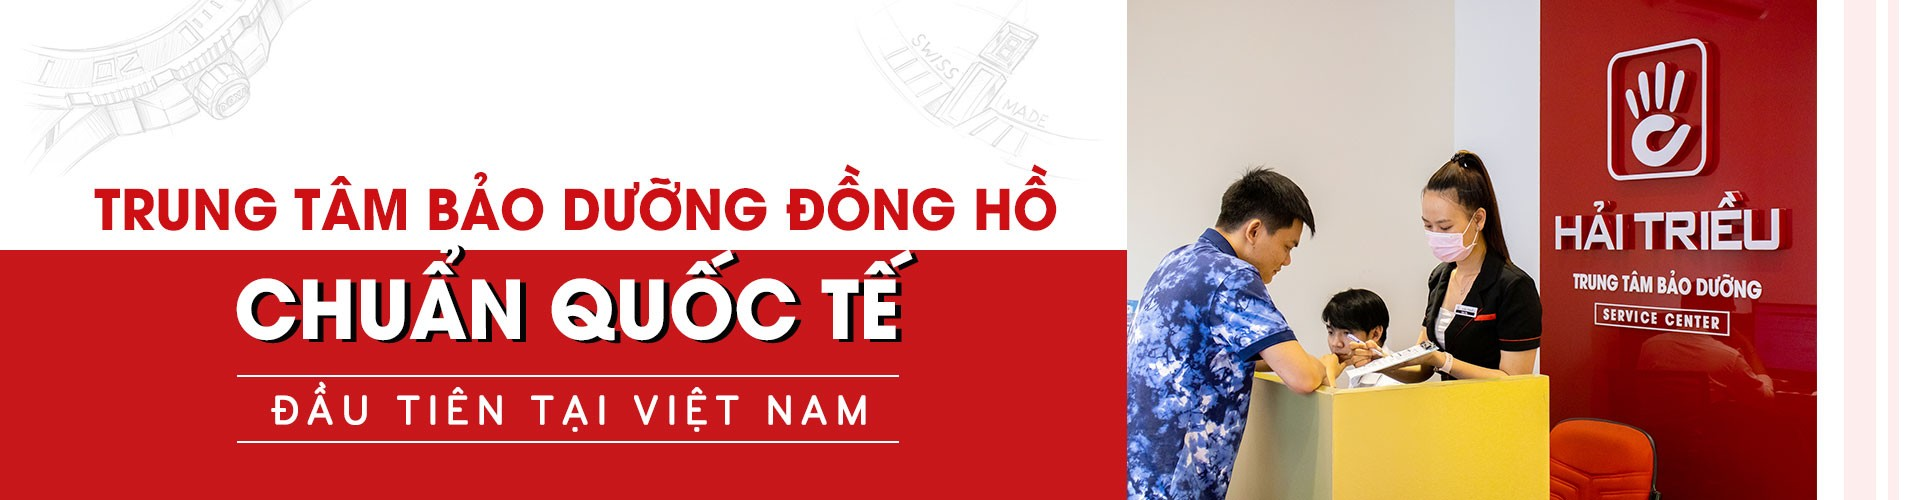 banner trung tam bao hanh dong ho hai trieu